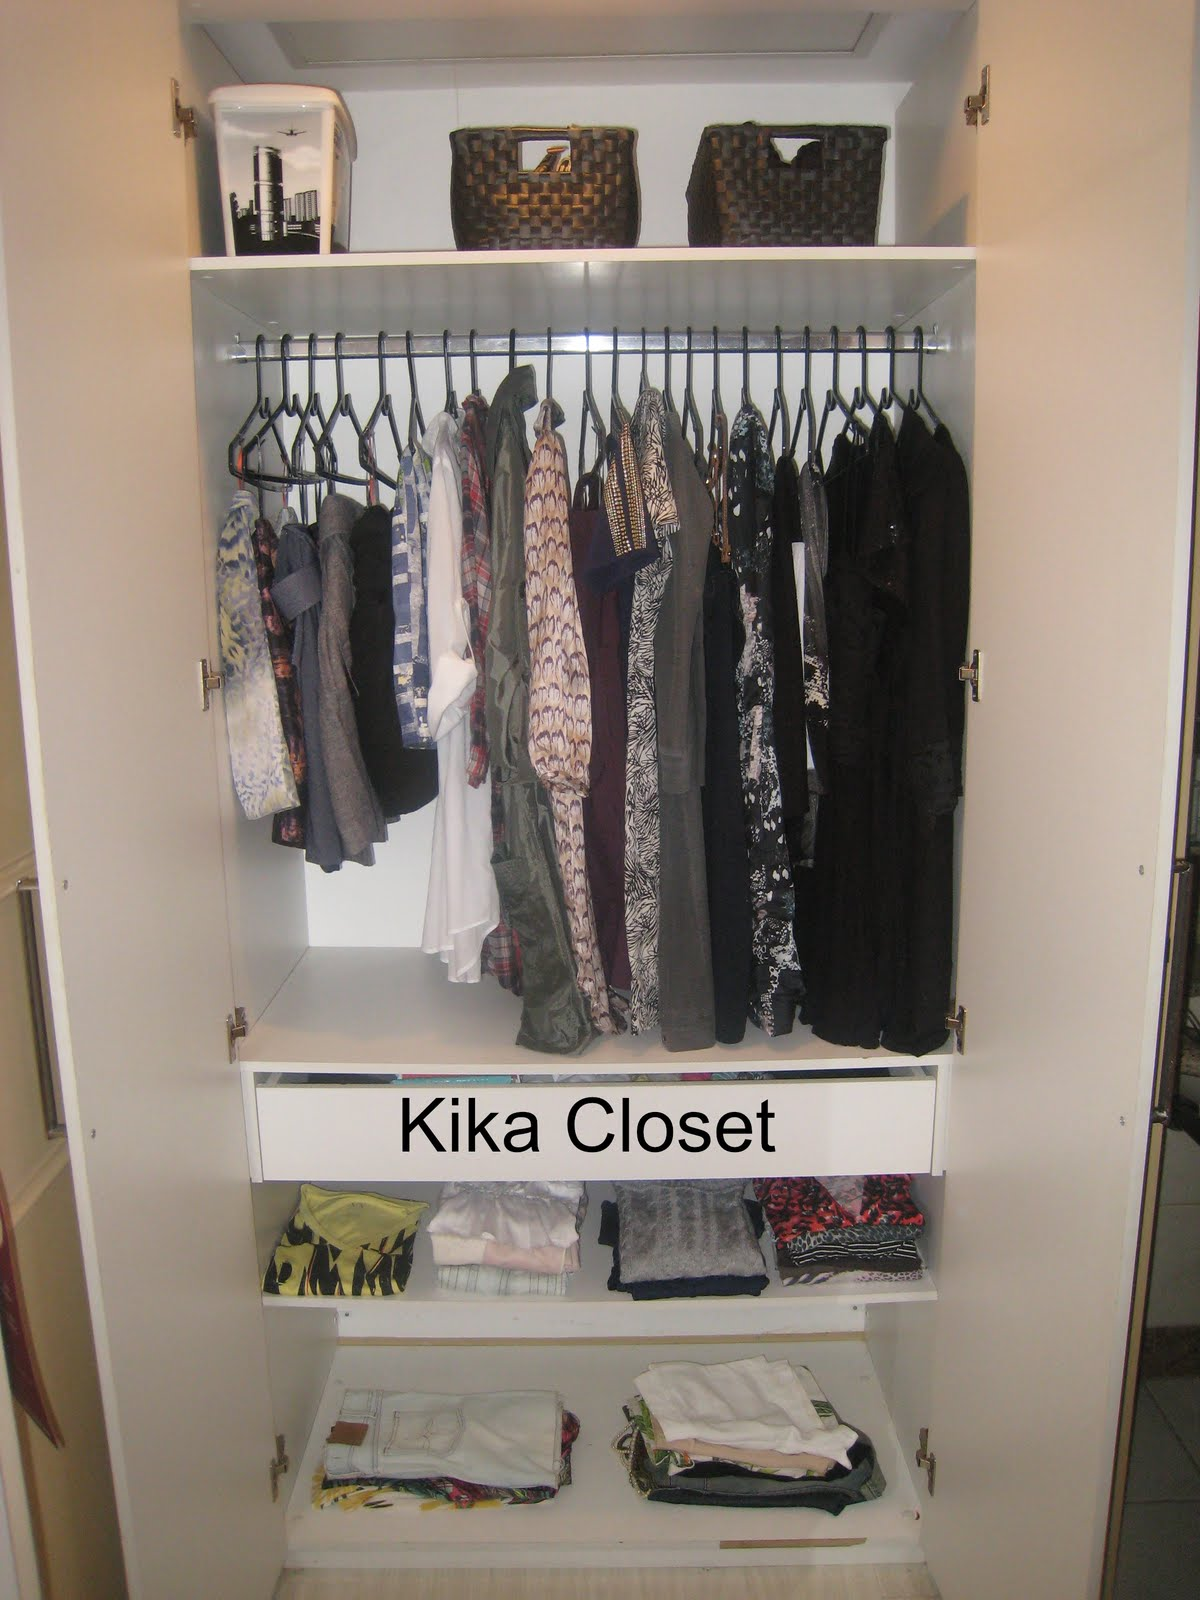 Armario Feminino ~ Kika Closet Organizando armario feminino